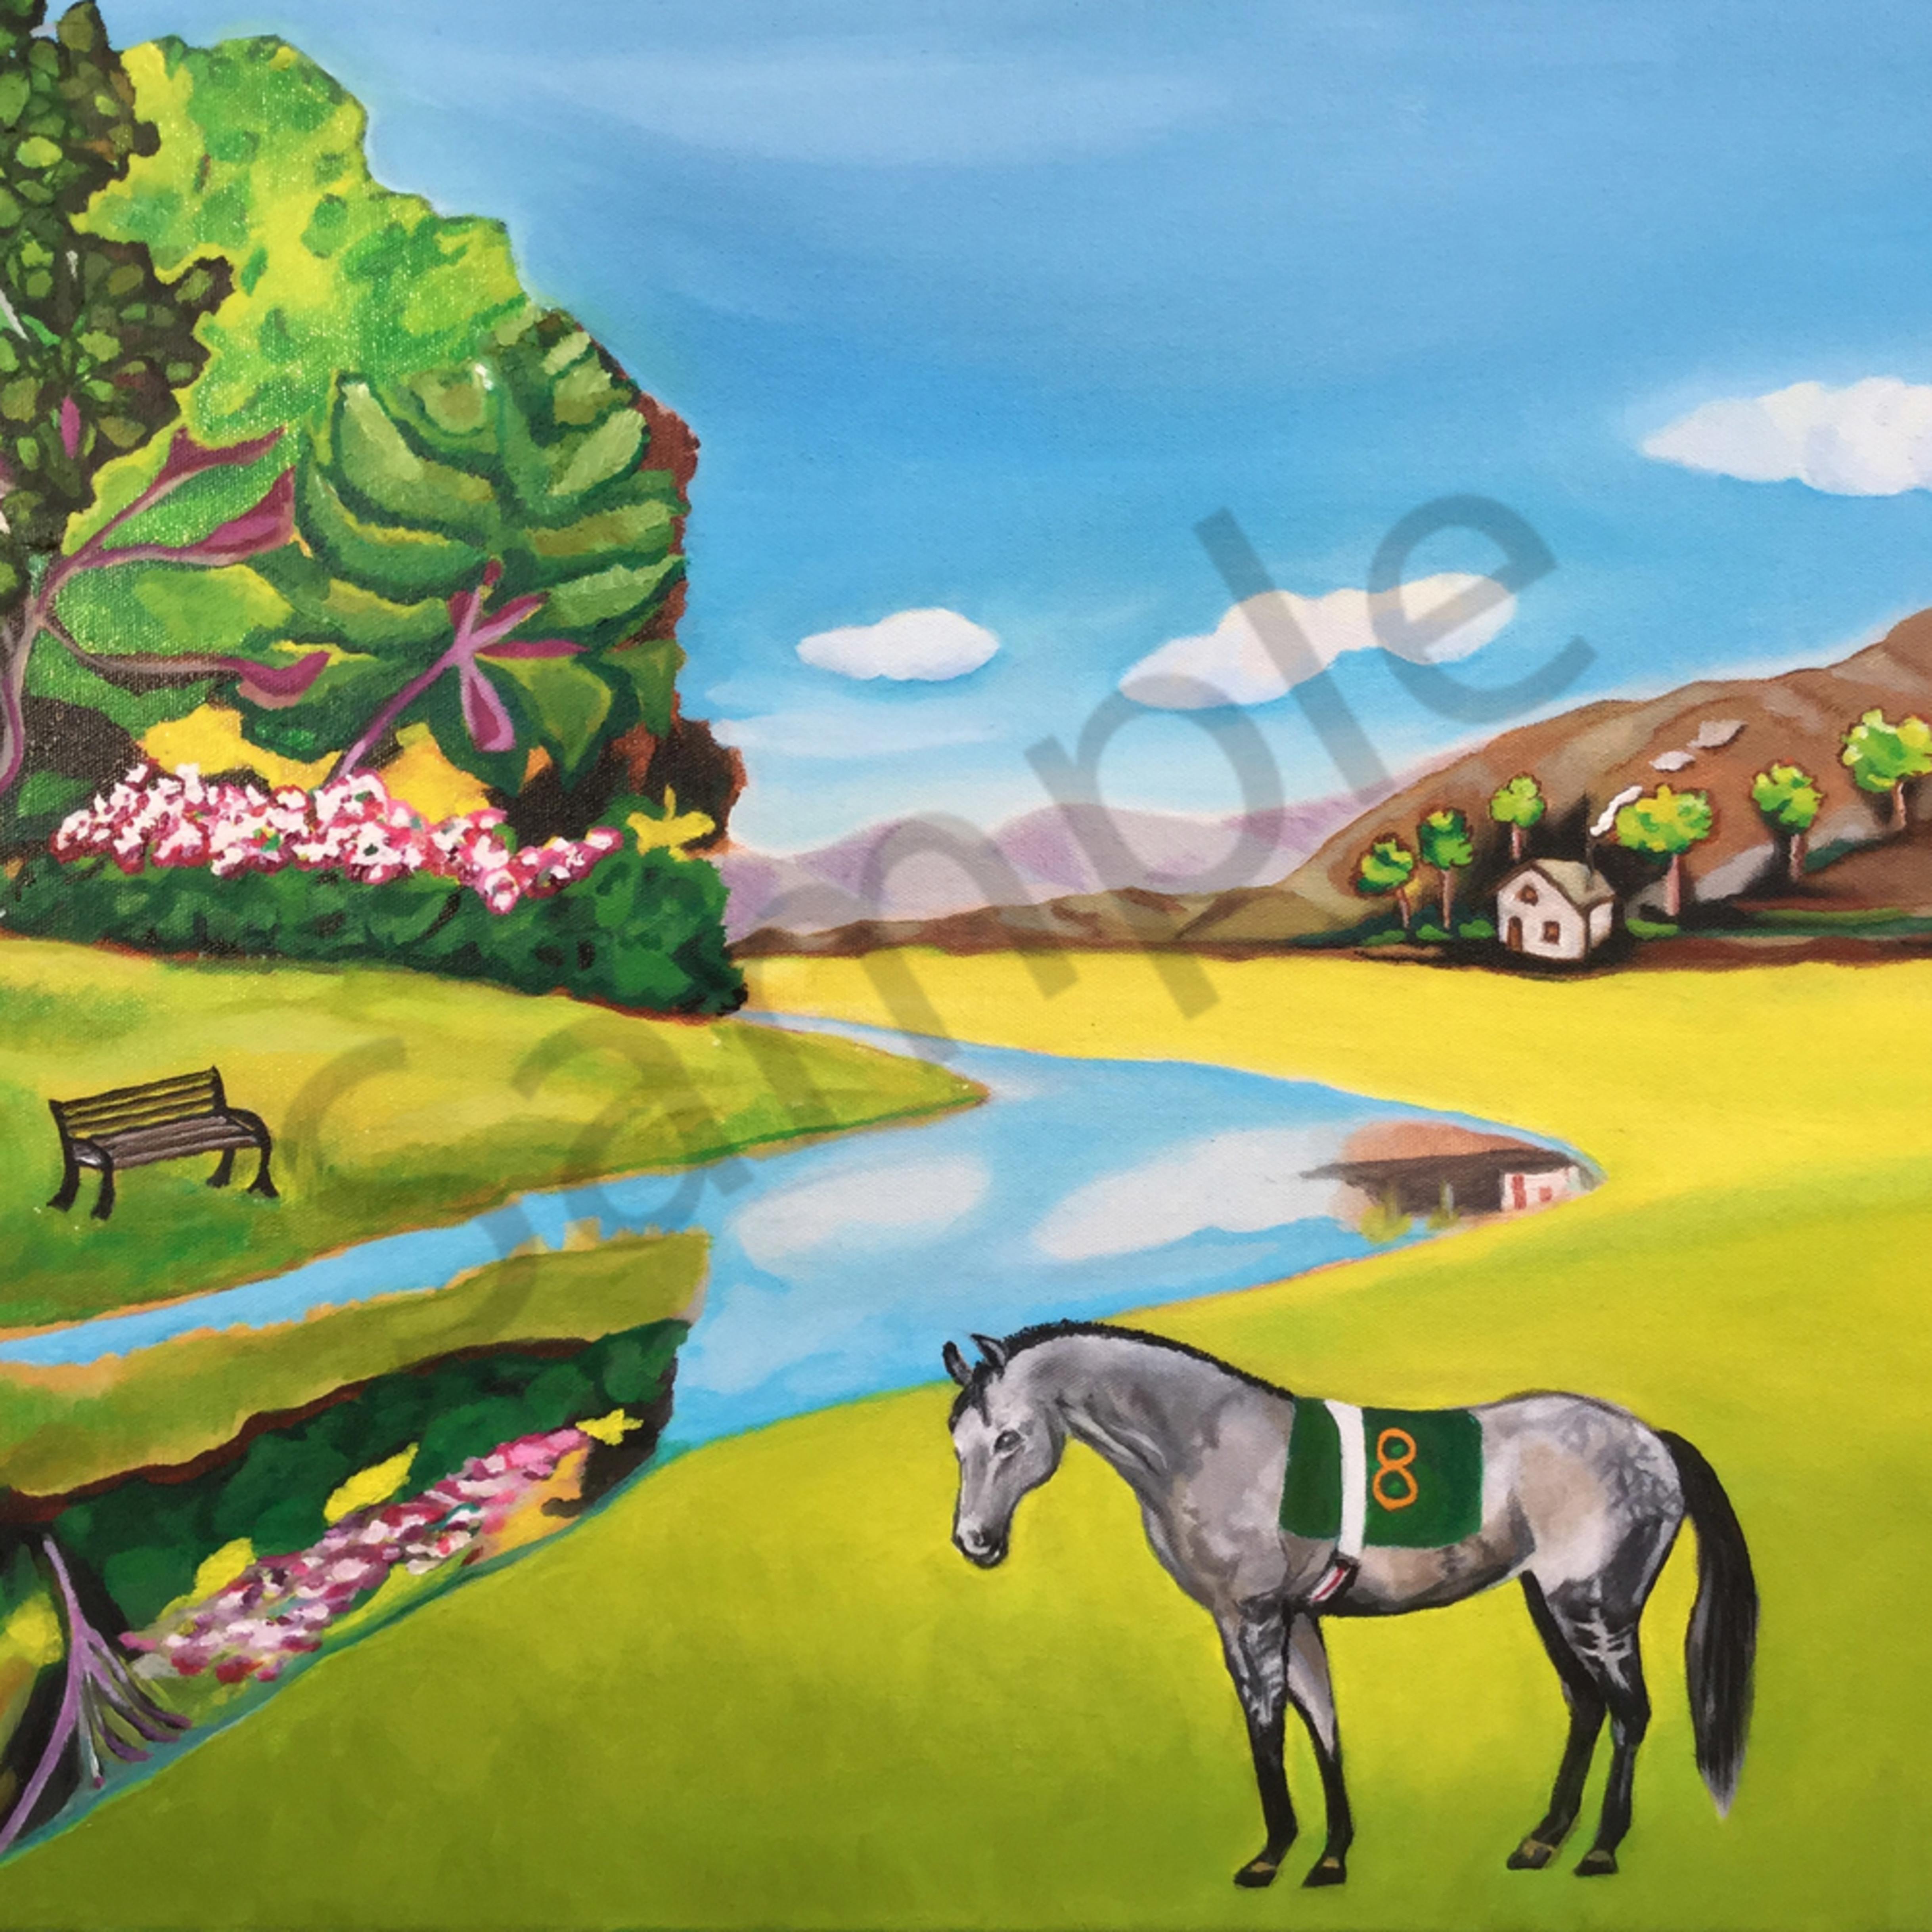 Ritual dance in repose equine painting final feb 2019 330 qqve5a